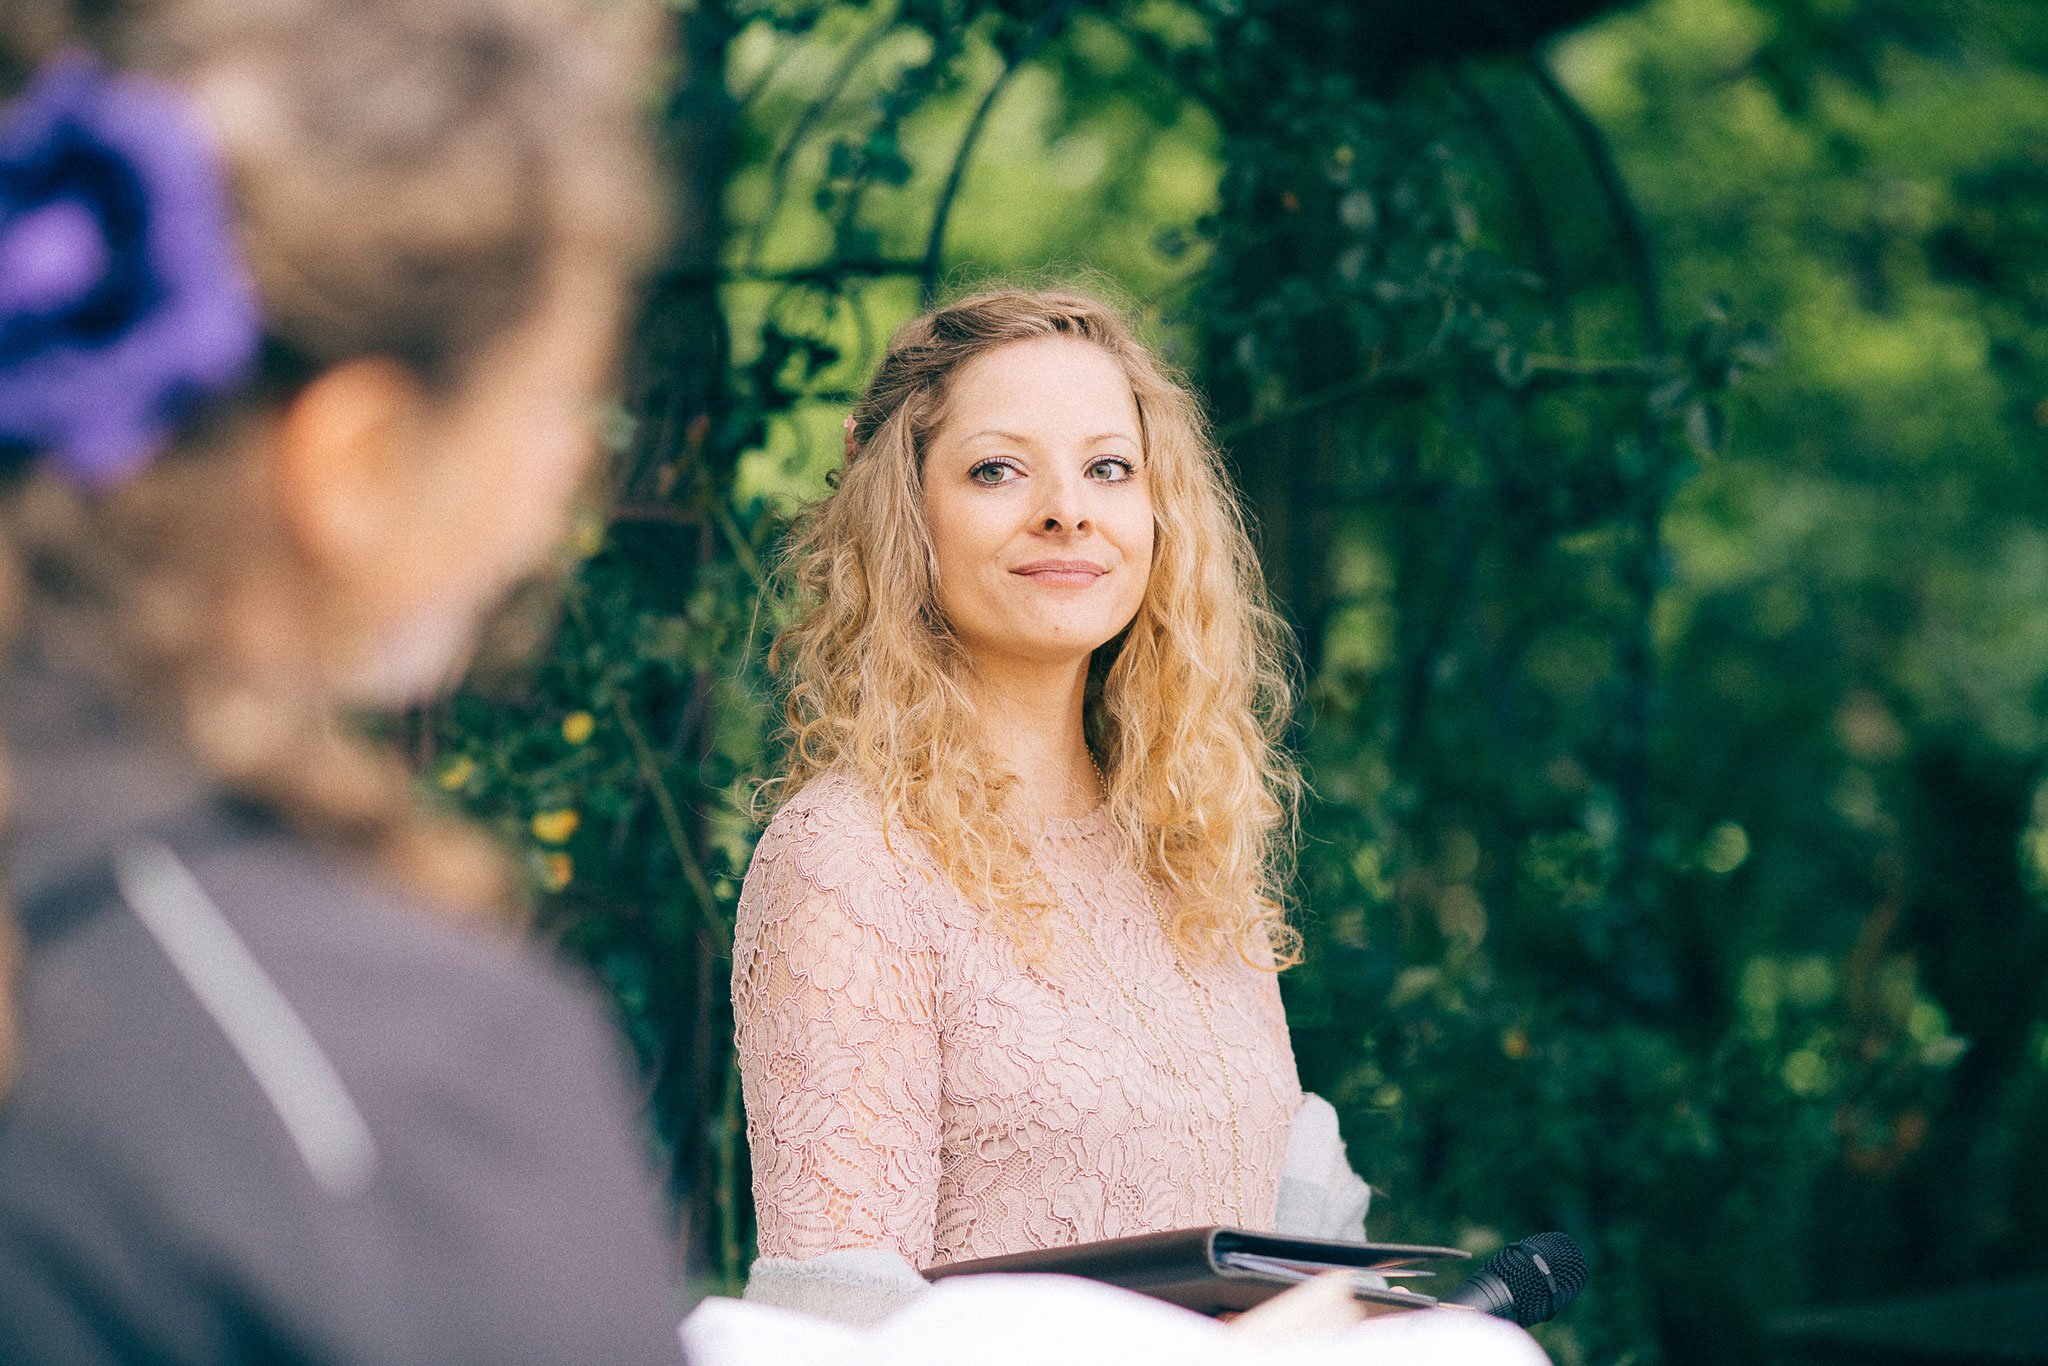 Hochzeitsrednerin Katharina Lehmkuhl (by Bettina Ortmeier)